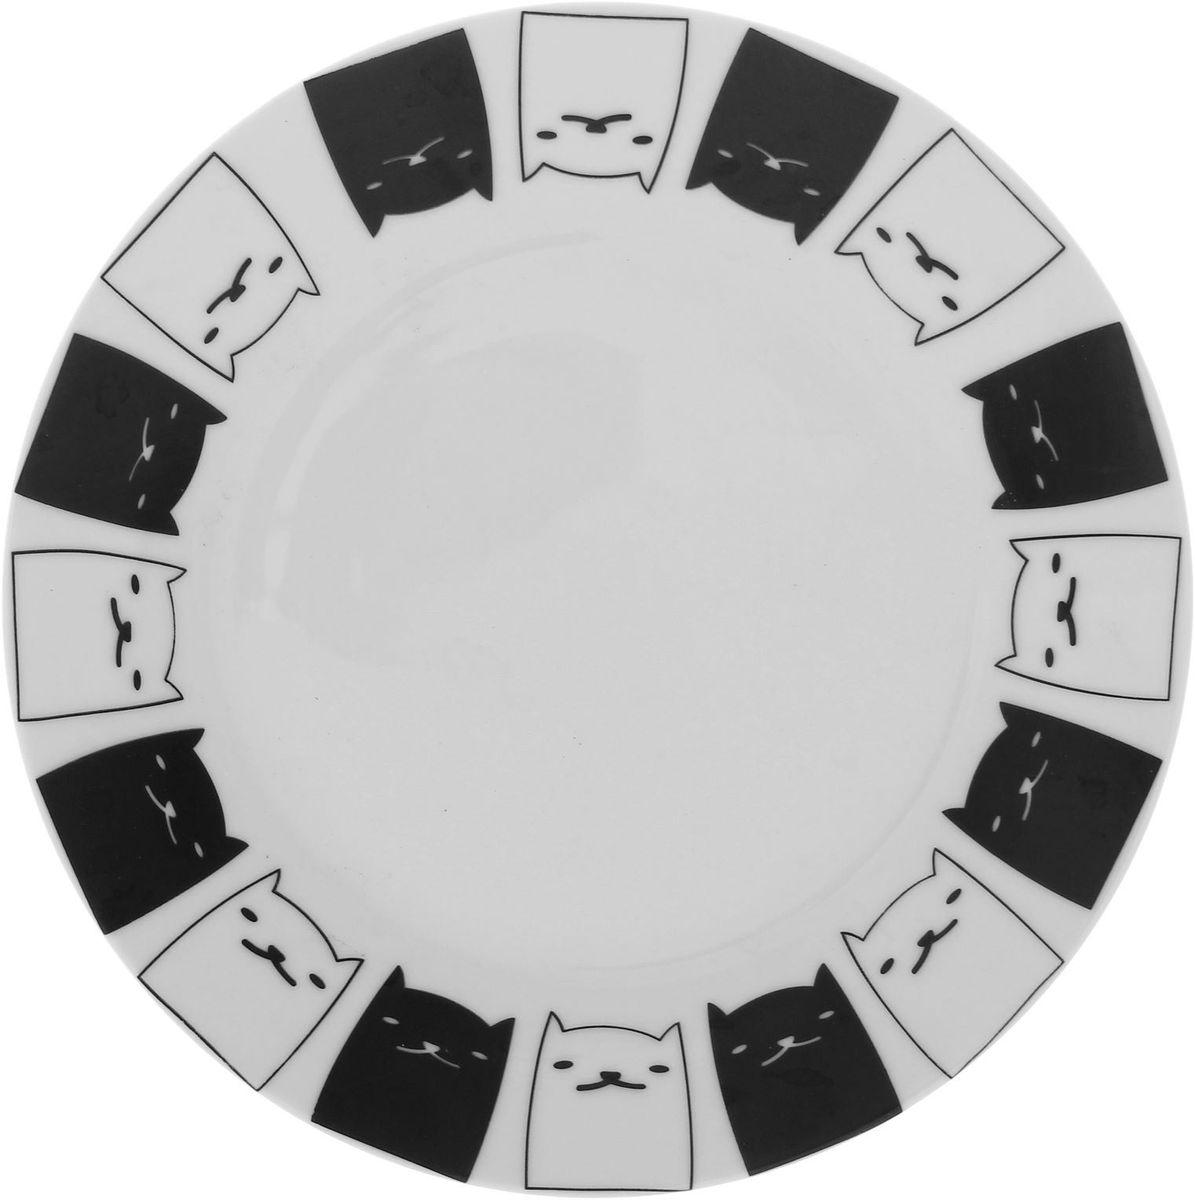 Тарелка мелкая Сотвори чудо Котята, диаметр 20 см тарелка мелкая сотвори чудо полярный мишка диаметр 20 см